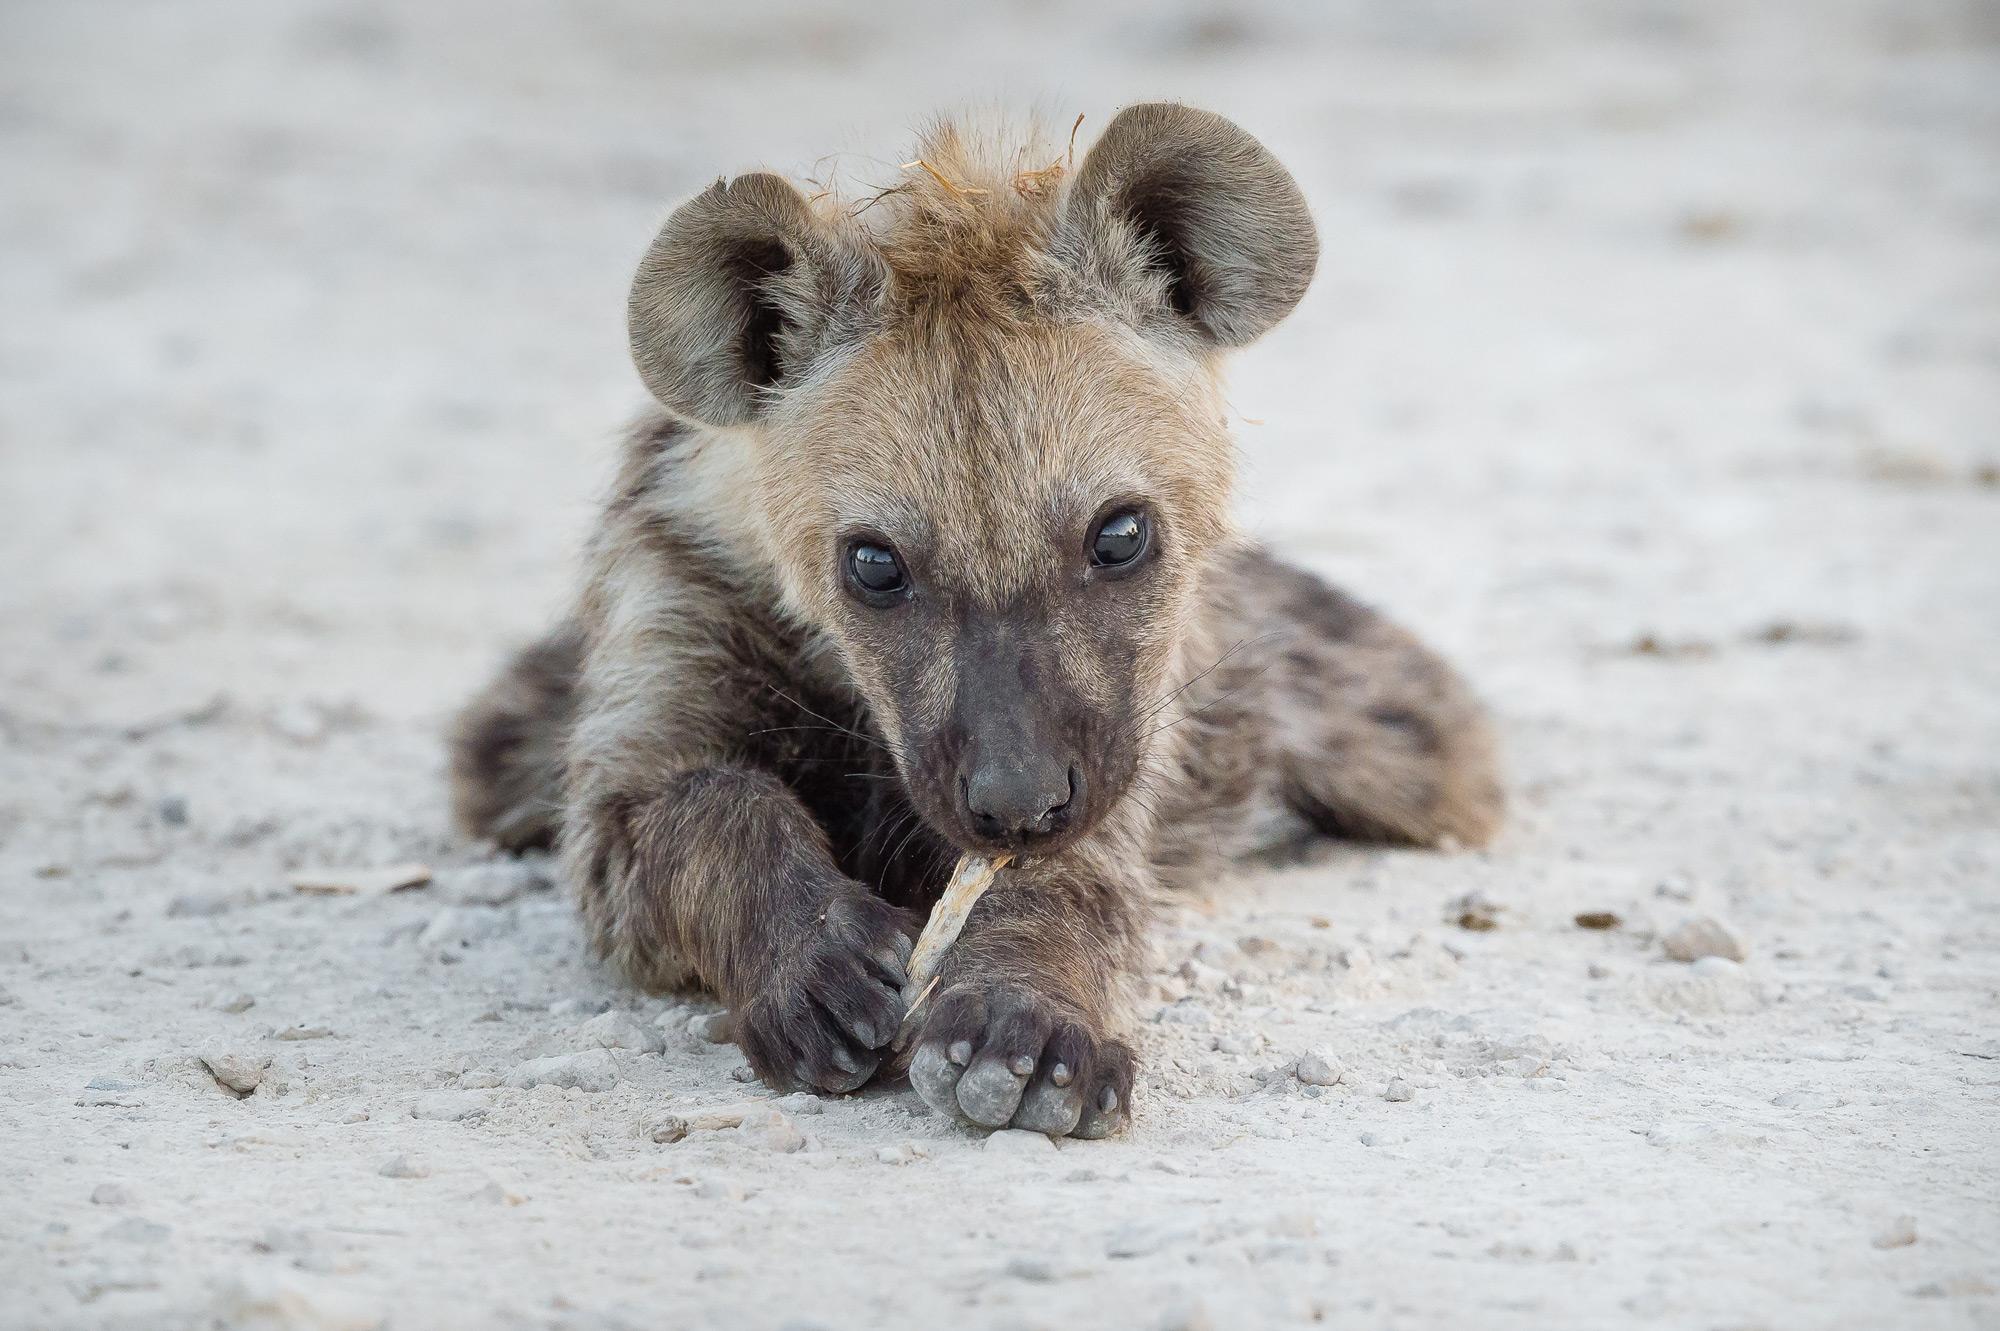 A hyena cub in Etosha National Park, Namibia